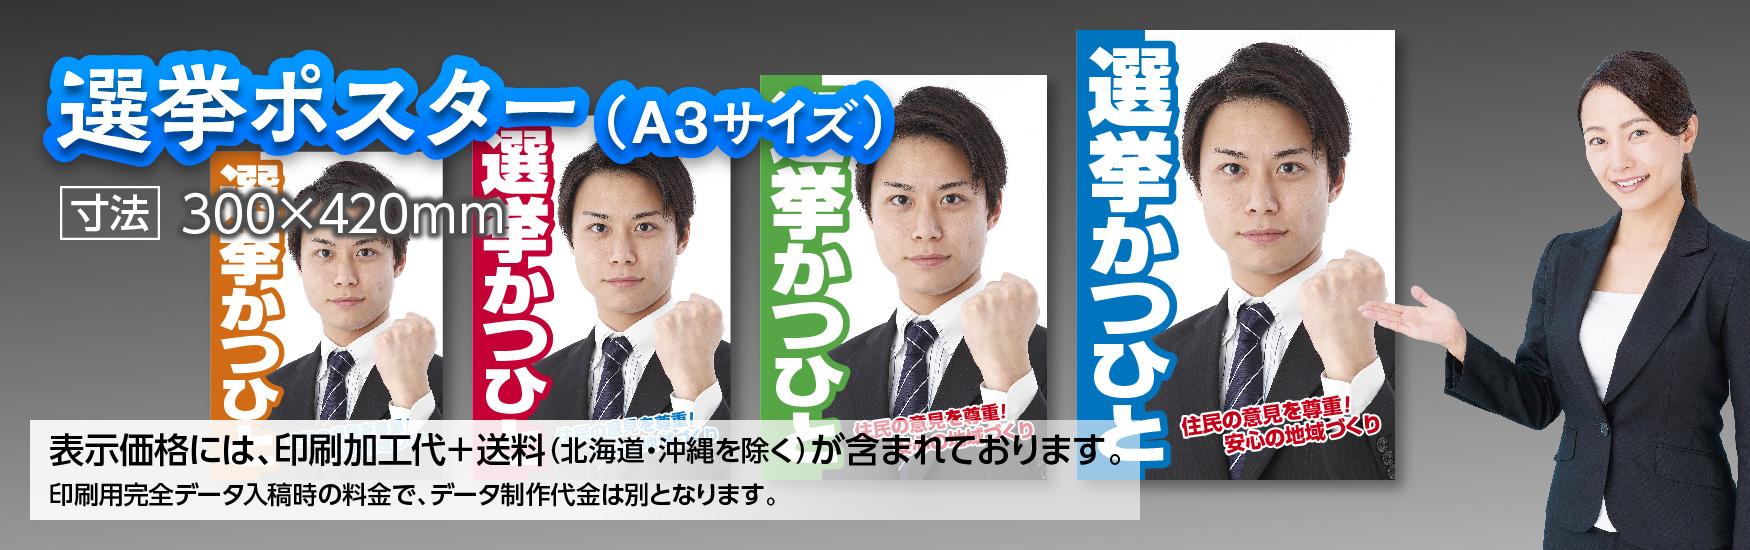 A3選挙ポスター印刷